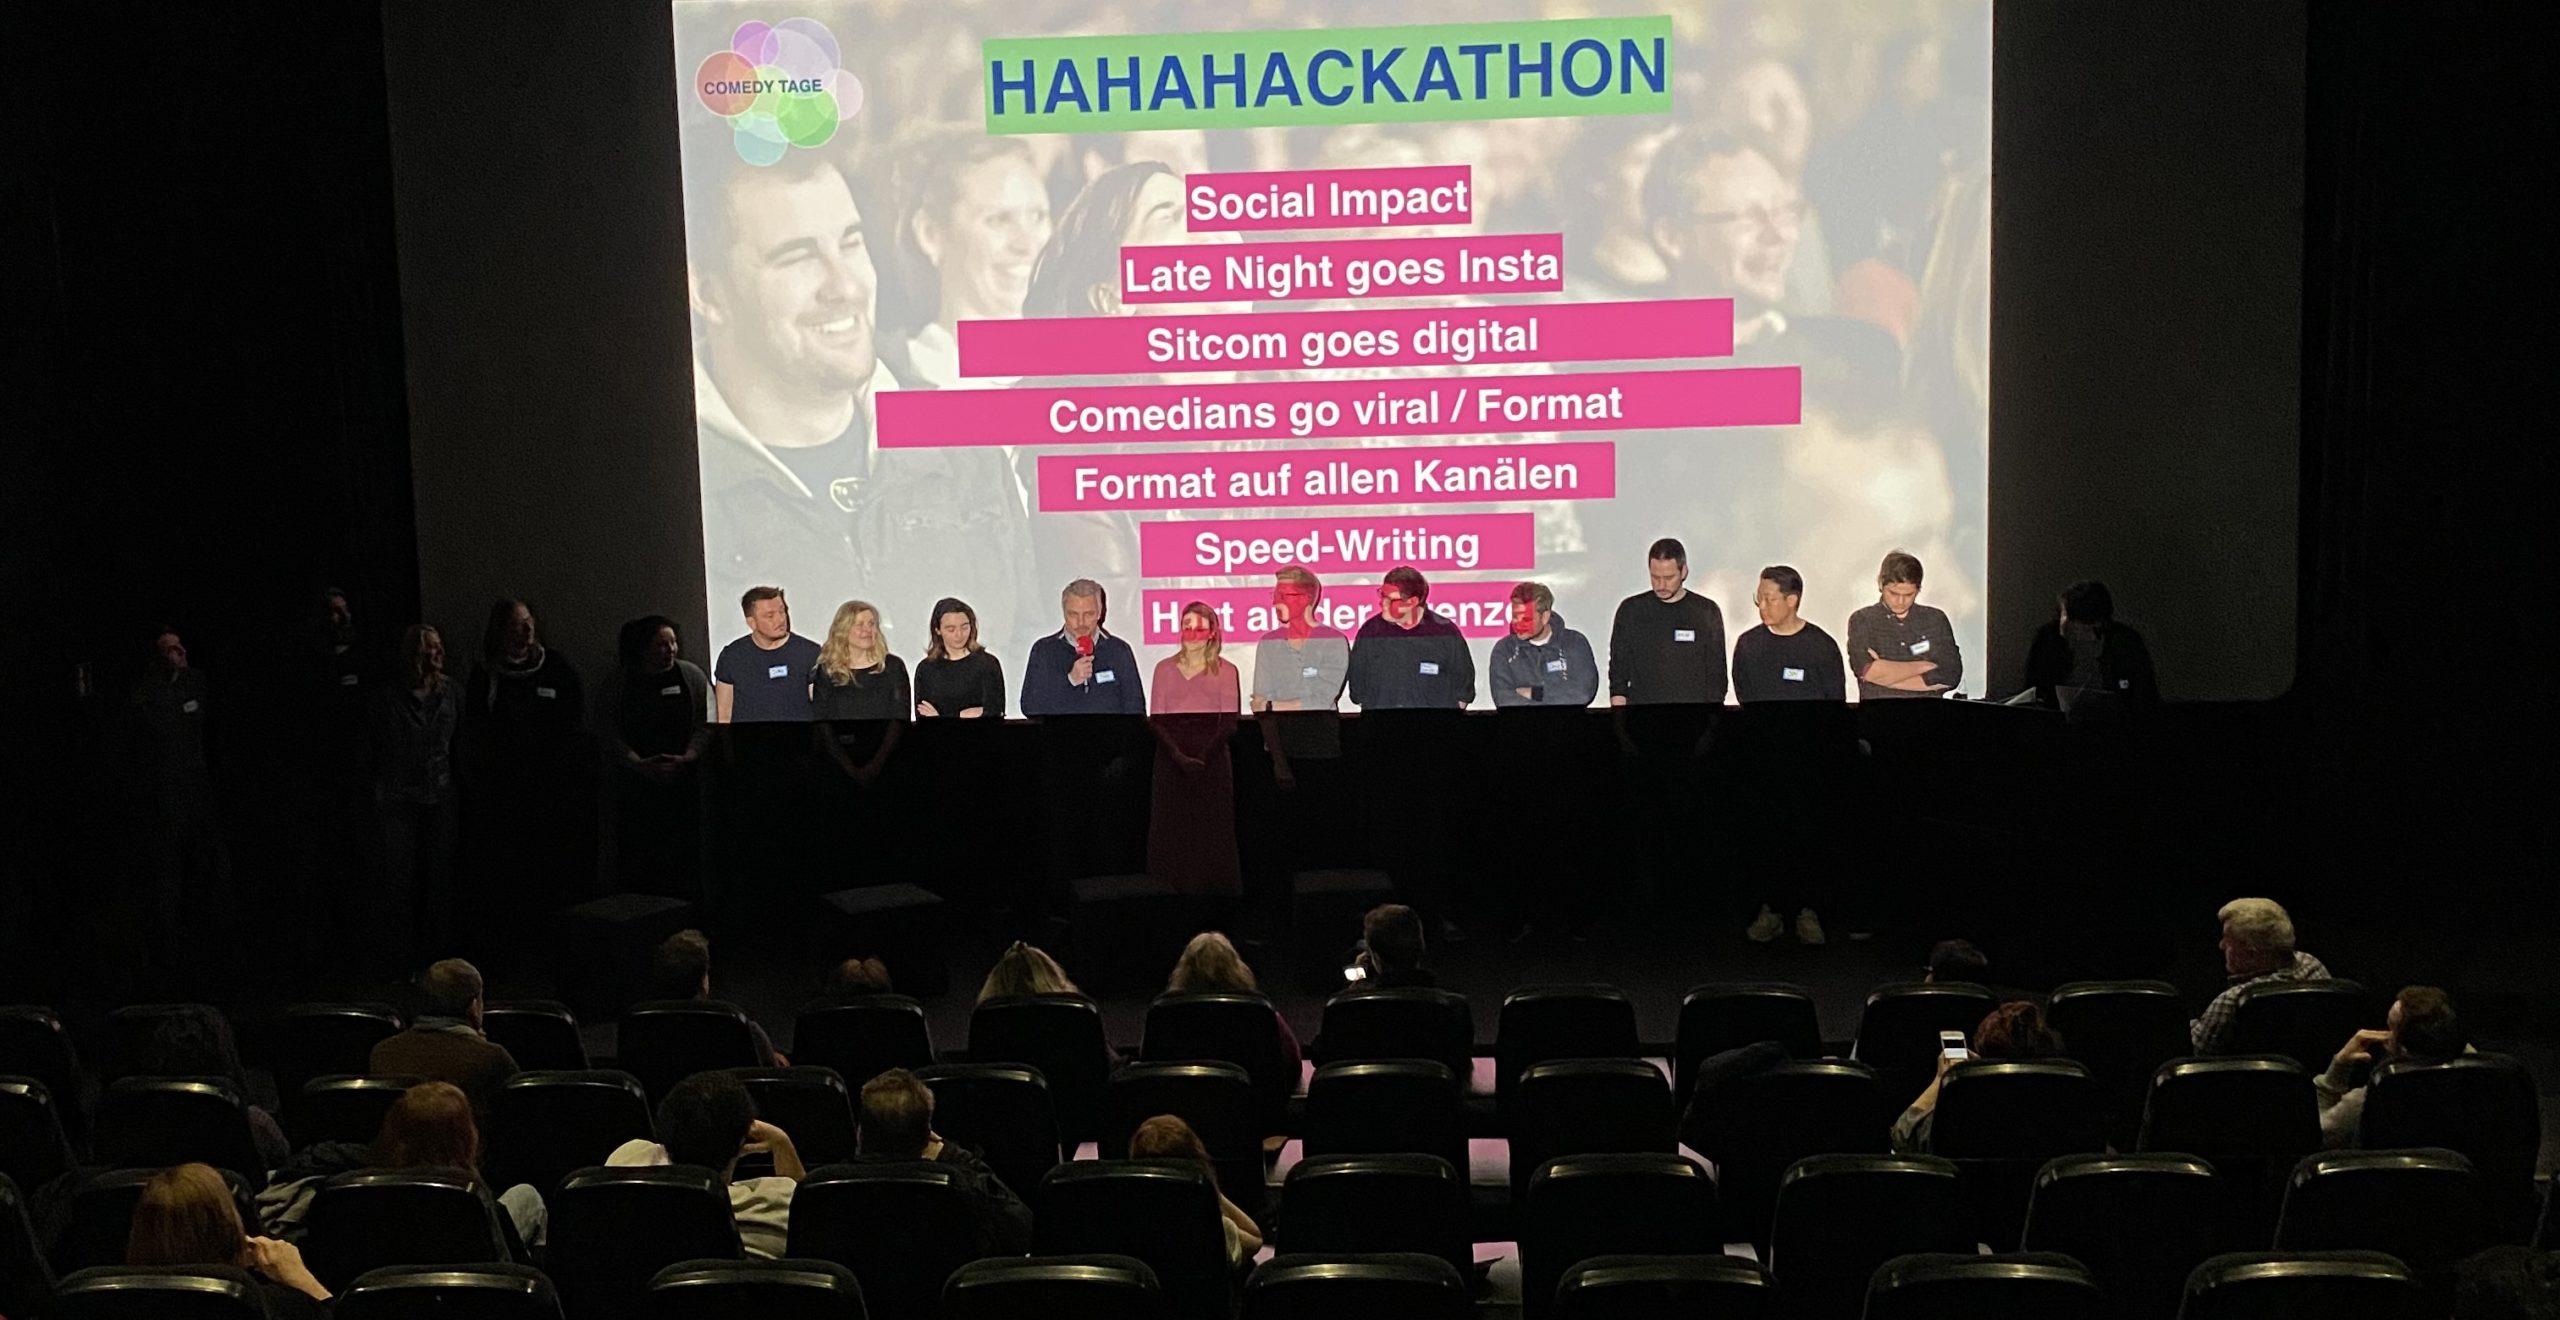 HaHaHackathon 2020